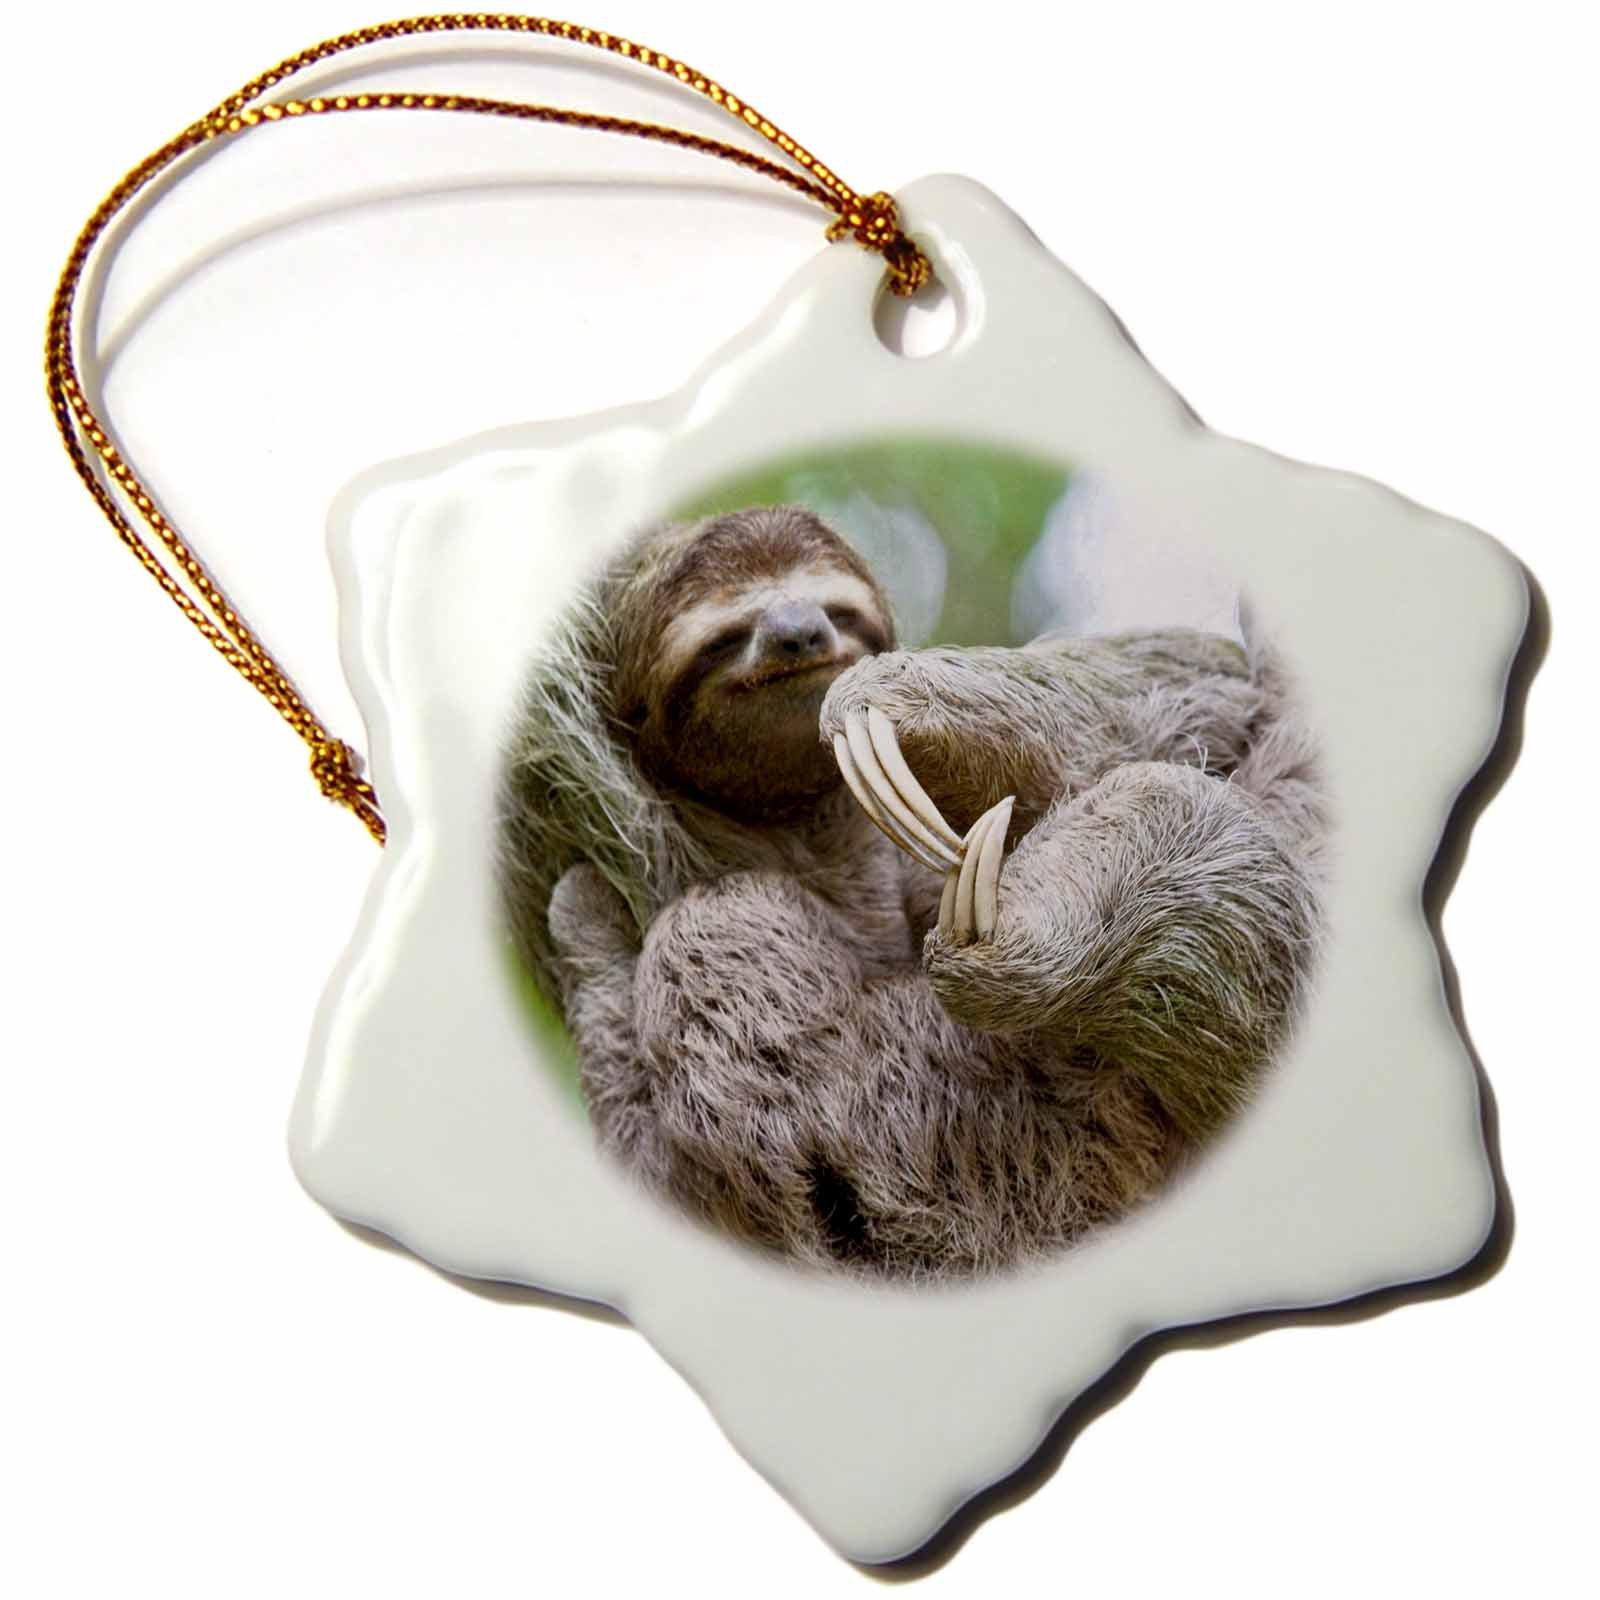 3dRose orn_87172_1 Brown-Throated Sloth Wildlife, Corcovado Costa Rica SA22 JGS0021 Jim Goldstein Snowflake Porcelain Ornament, 3-Inch